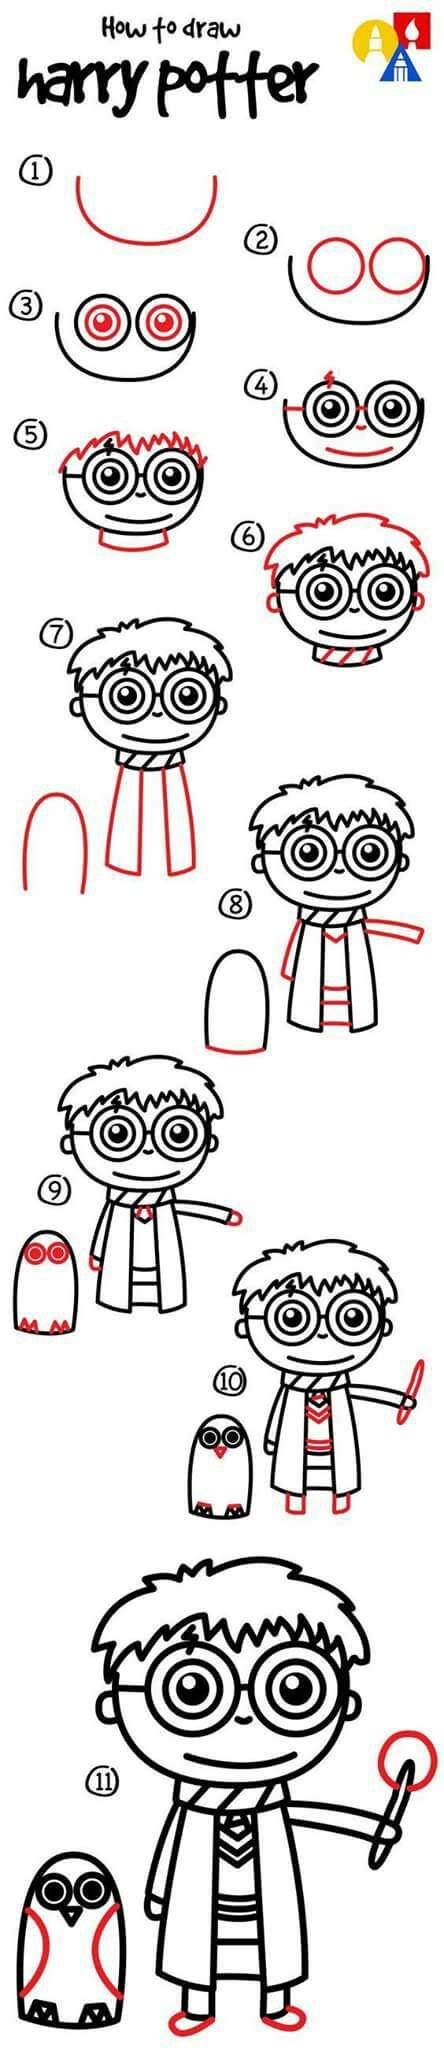 How To Draw Harry Potter I Love Harry Potter Dibujos Fáciles